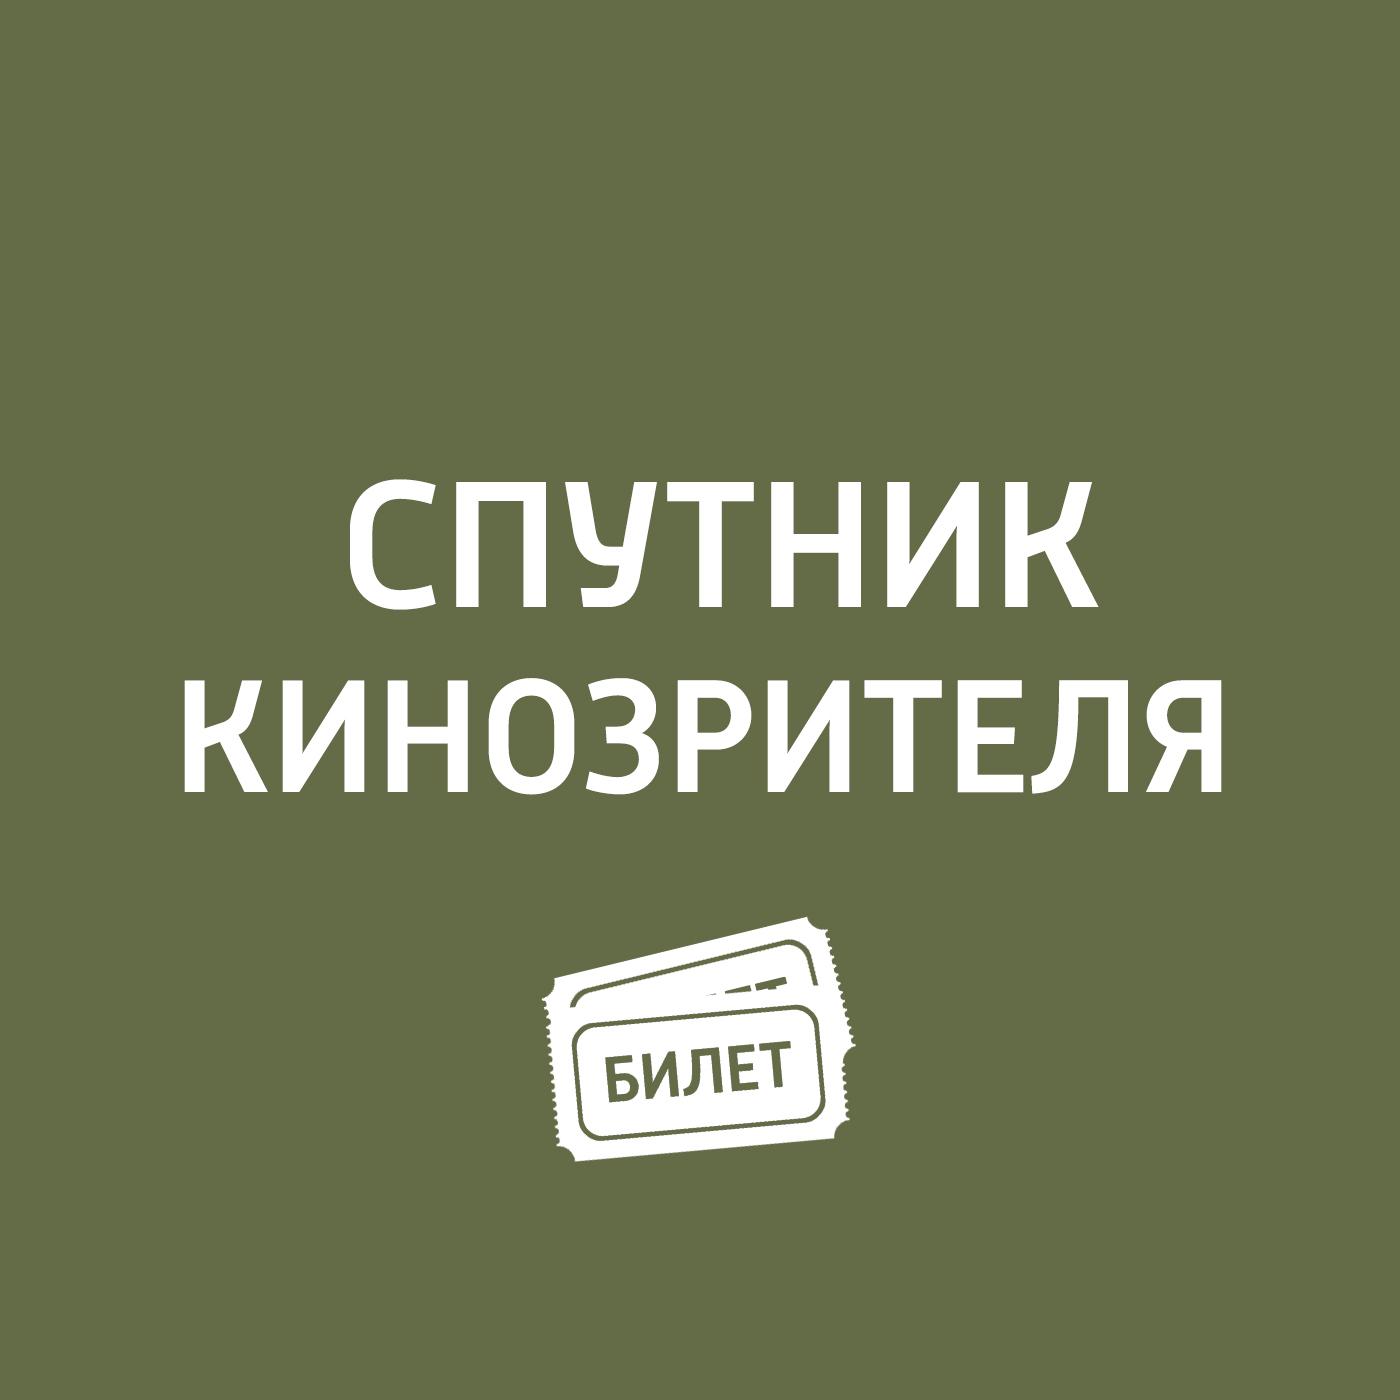 Антон Долин Уолтер Элайас Дисней уолт дисней калейдоскоп